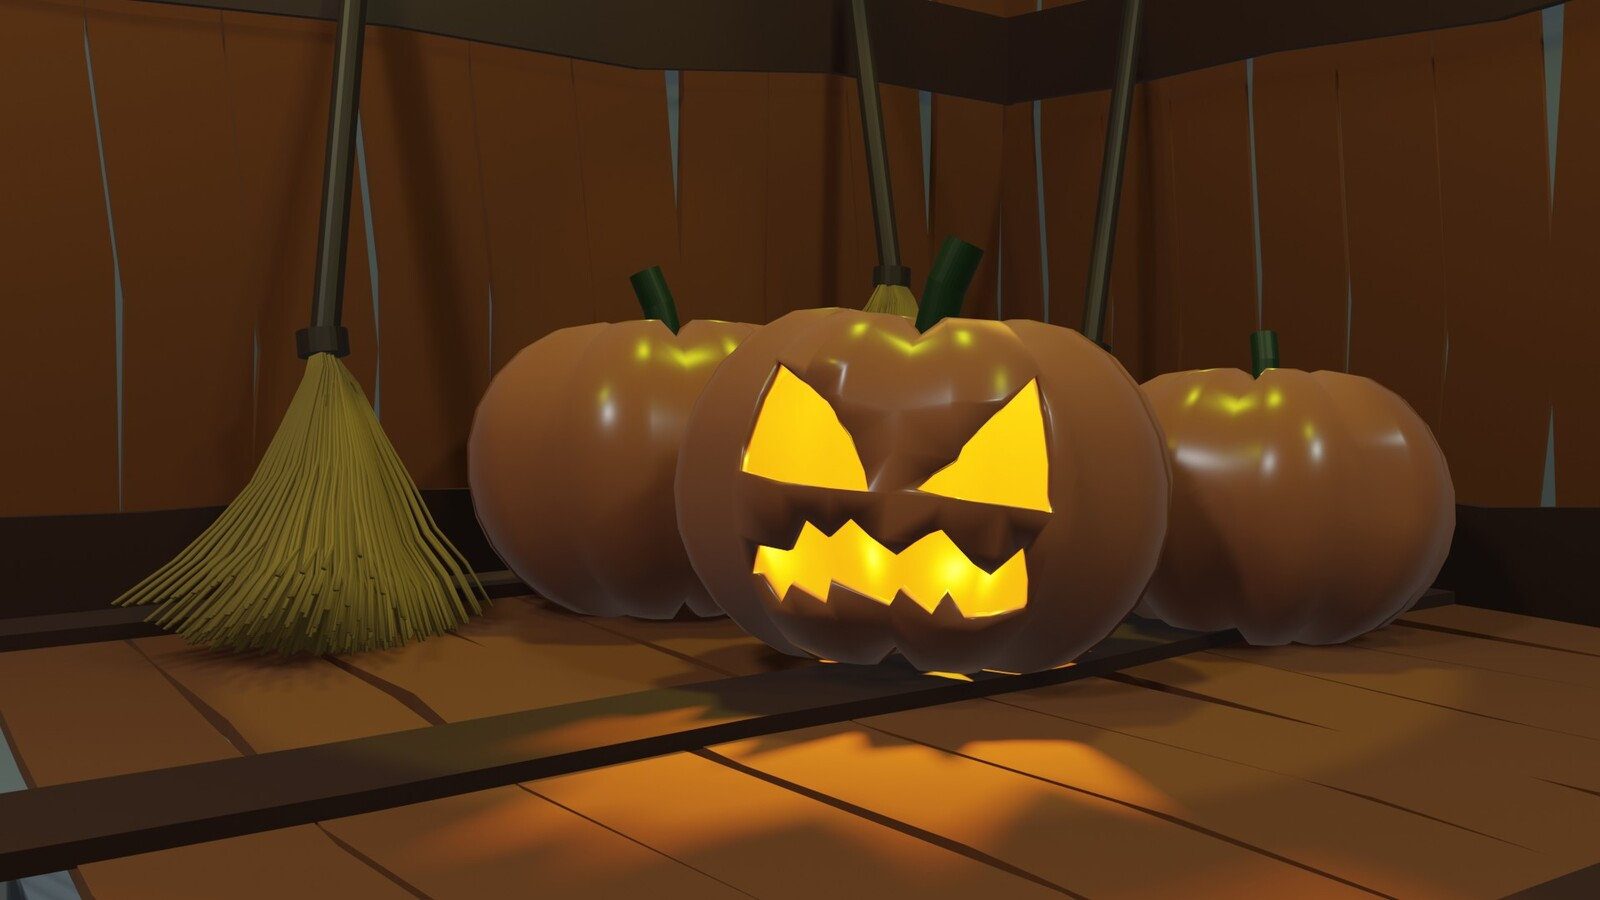 Scary Pumpkin with normal Pumpkin